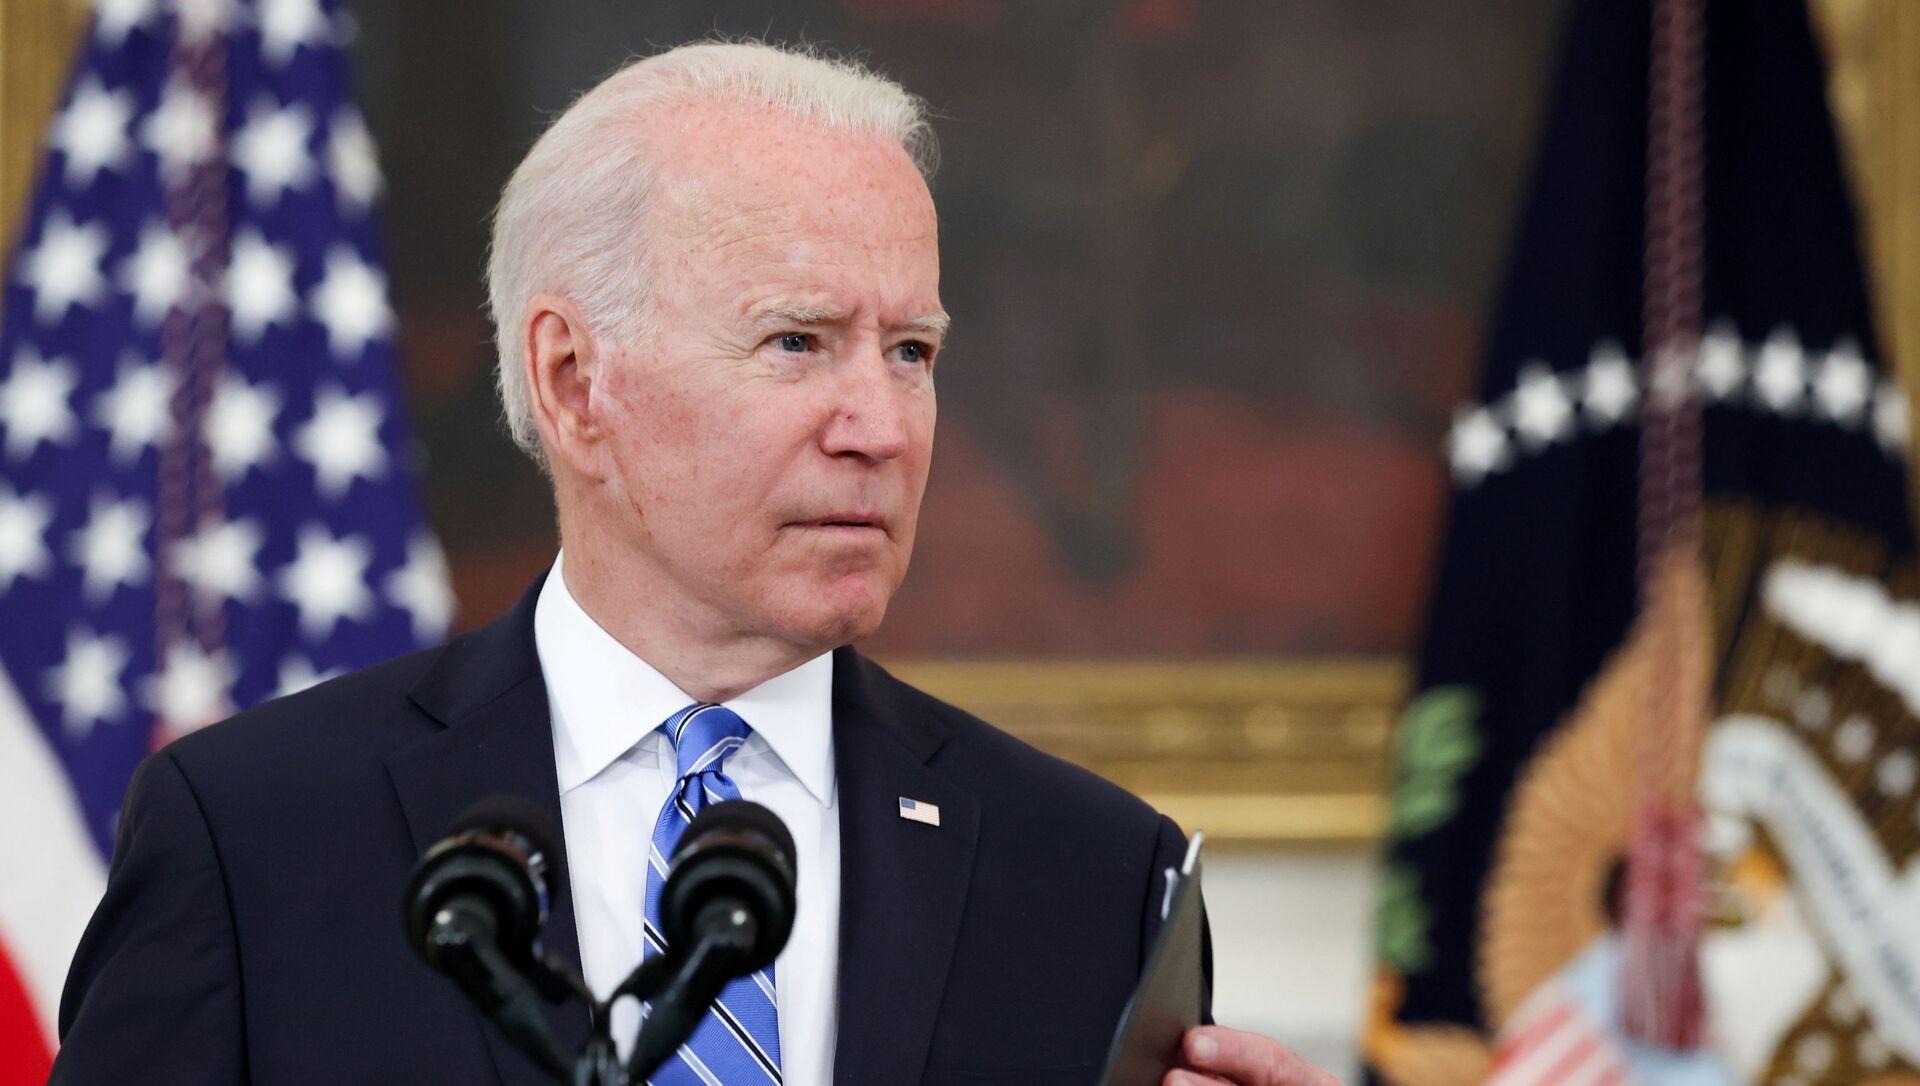 U.S. President Joe Biden delivers remarks on the economy at the White House in Washington, U.S. July 19, 2021.  - Sputnik International, 1920, 25.07.2021